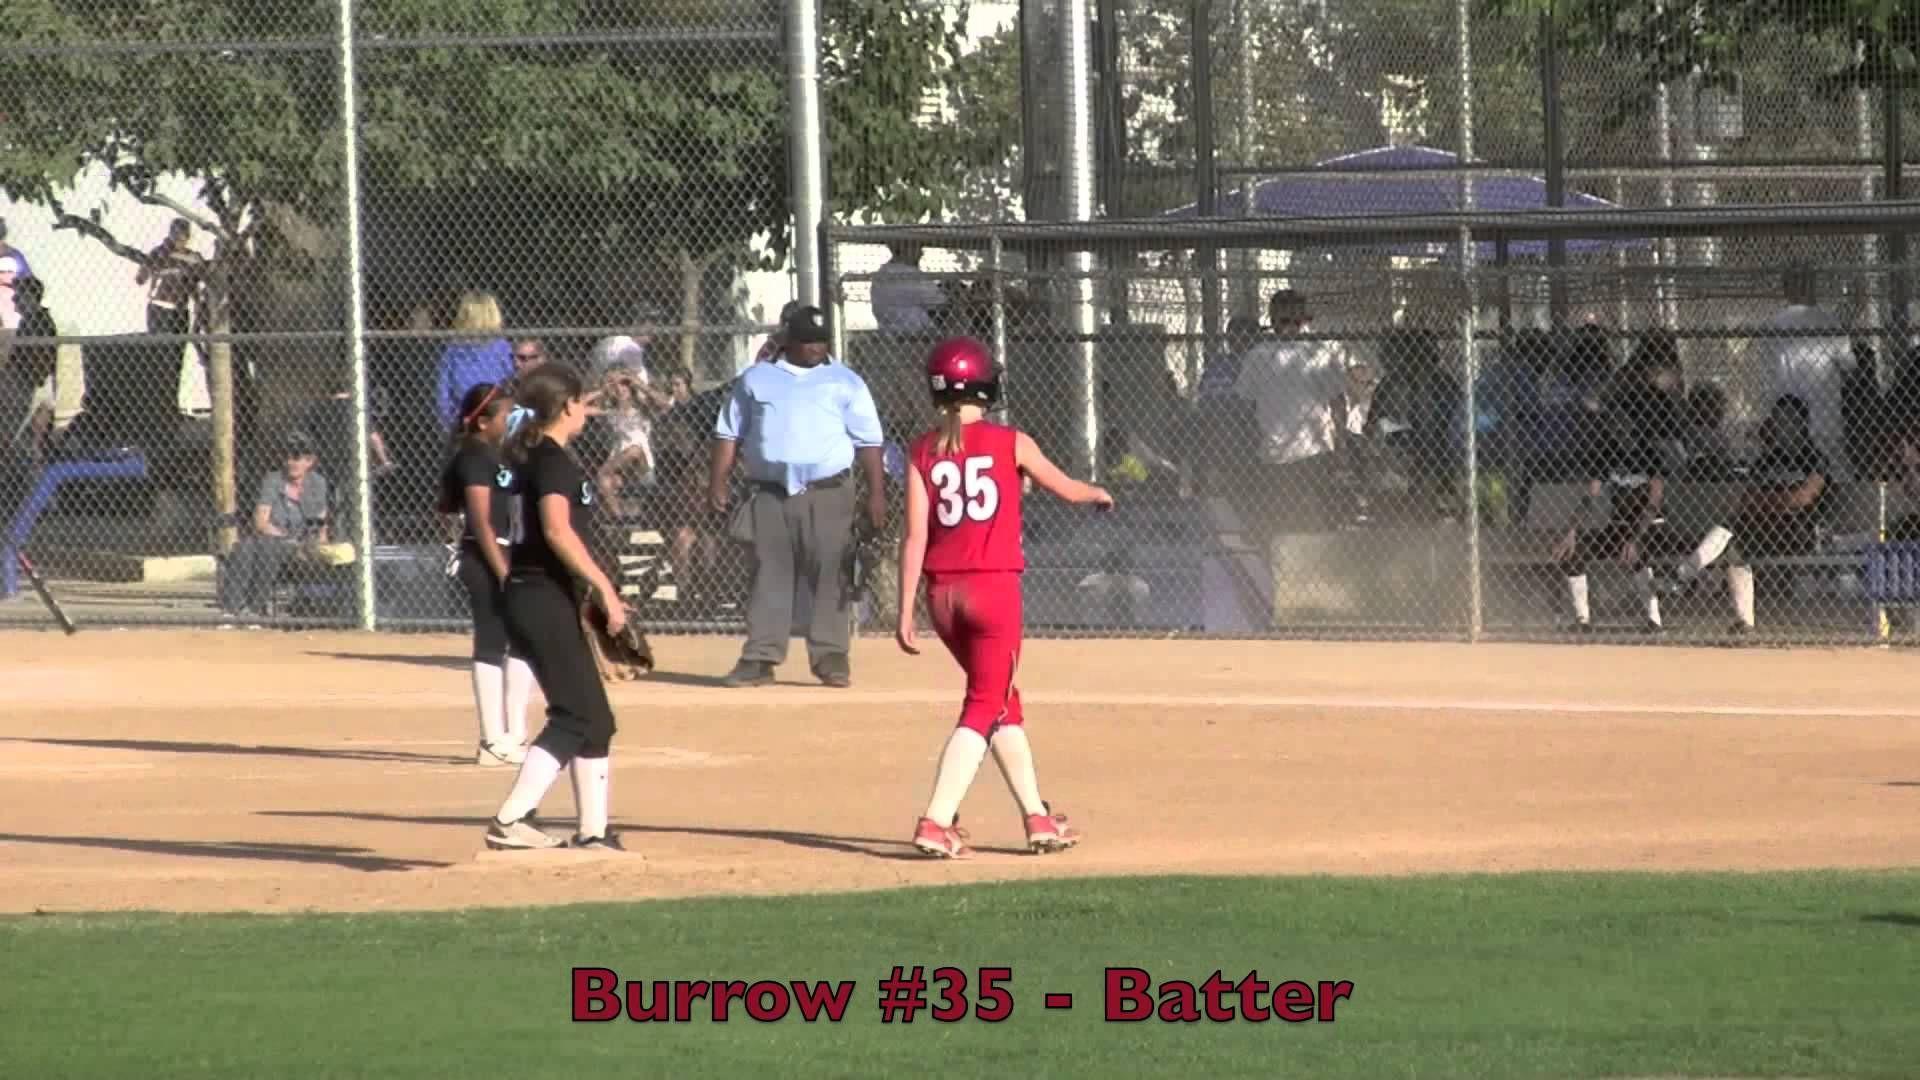 Emily Burrow 2 RBI Double, Steal 3rd & Home Vs Magic.Fast